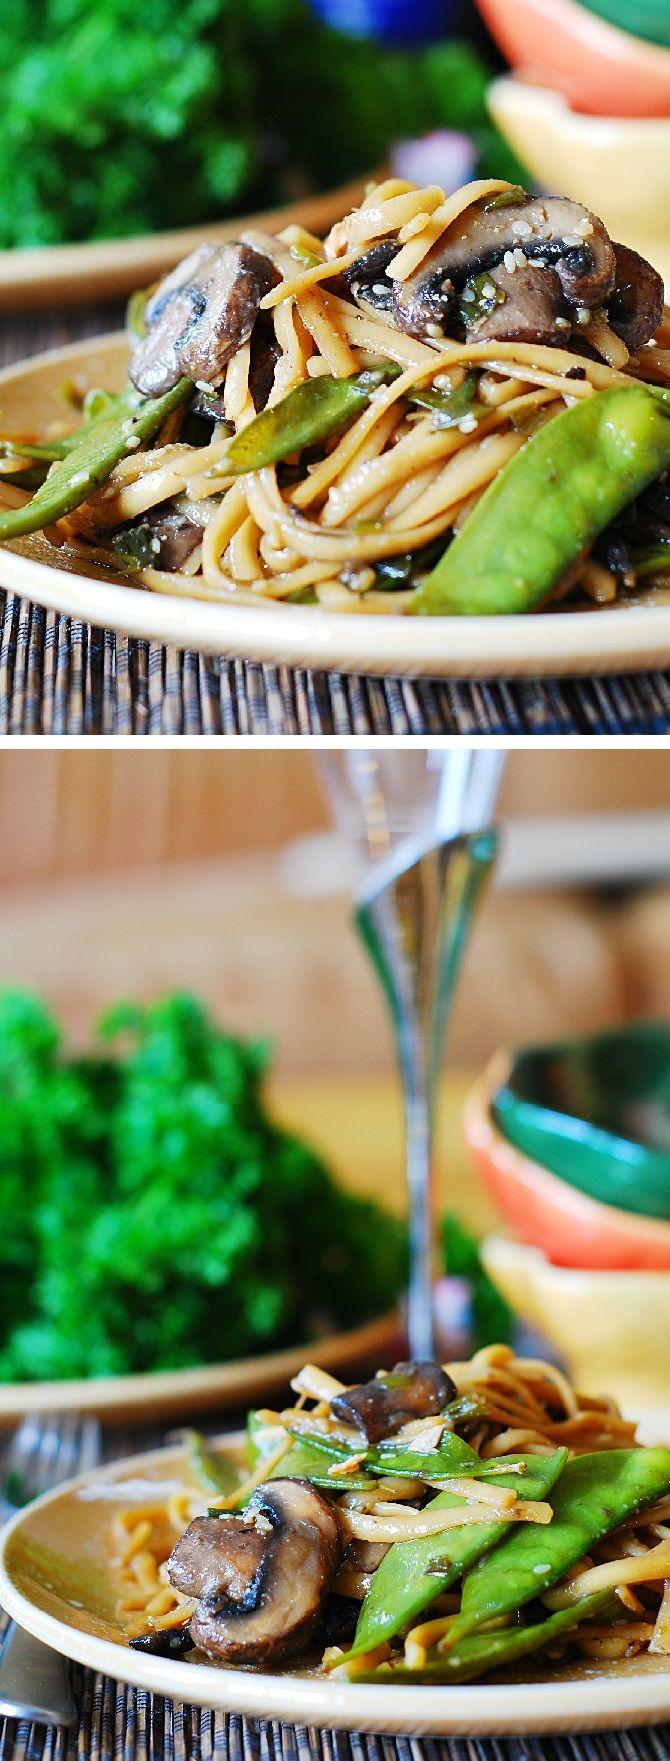 ... Noodles & Such on Pinterest | Sesame noodles, Asian noodles and Spicy